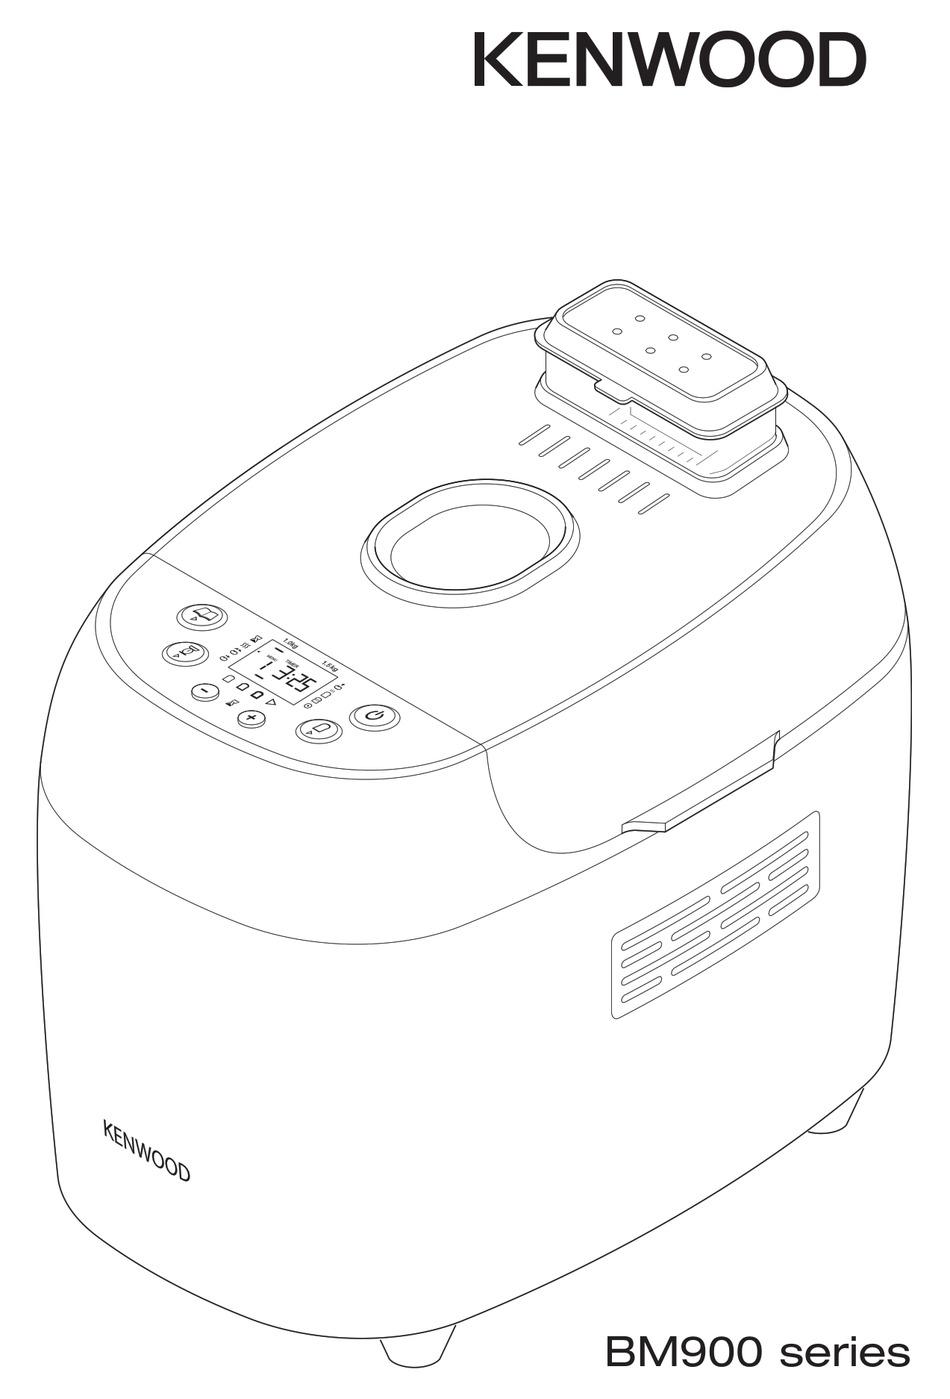 KENWOOD BM900 SERIES INSTRUCTIONS MANUAL Pdf Download